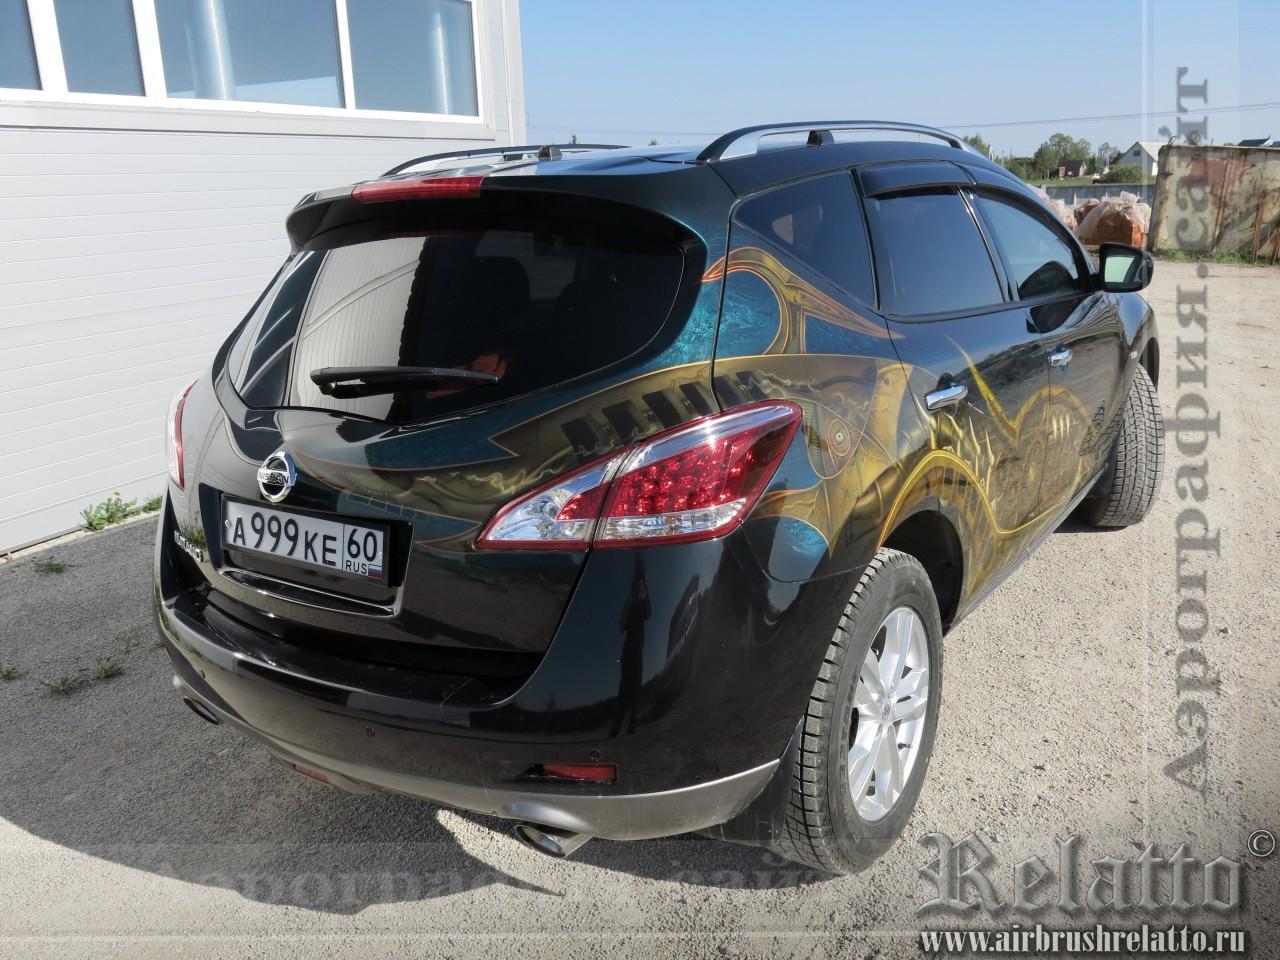 Роспись автомобиля Nissan Murano airbrush